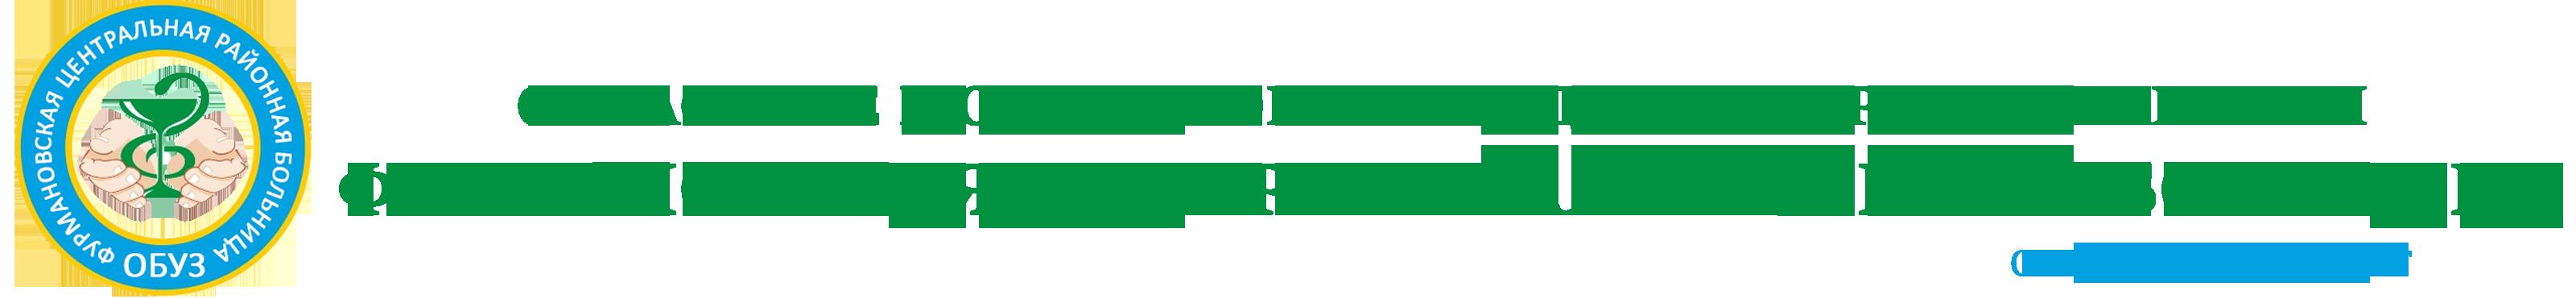 ОБУЗ Фурмановская ЦРБ